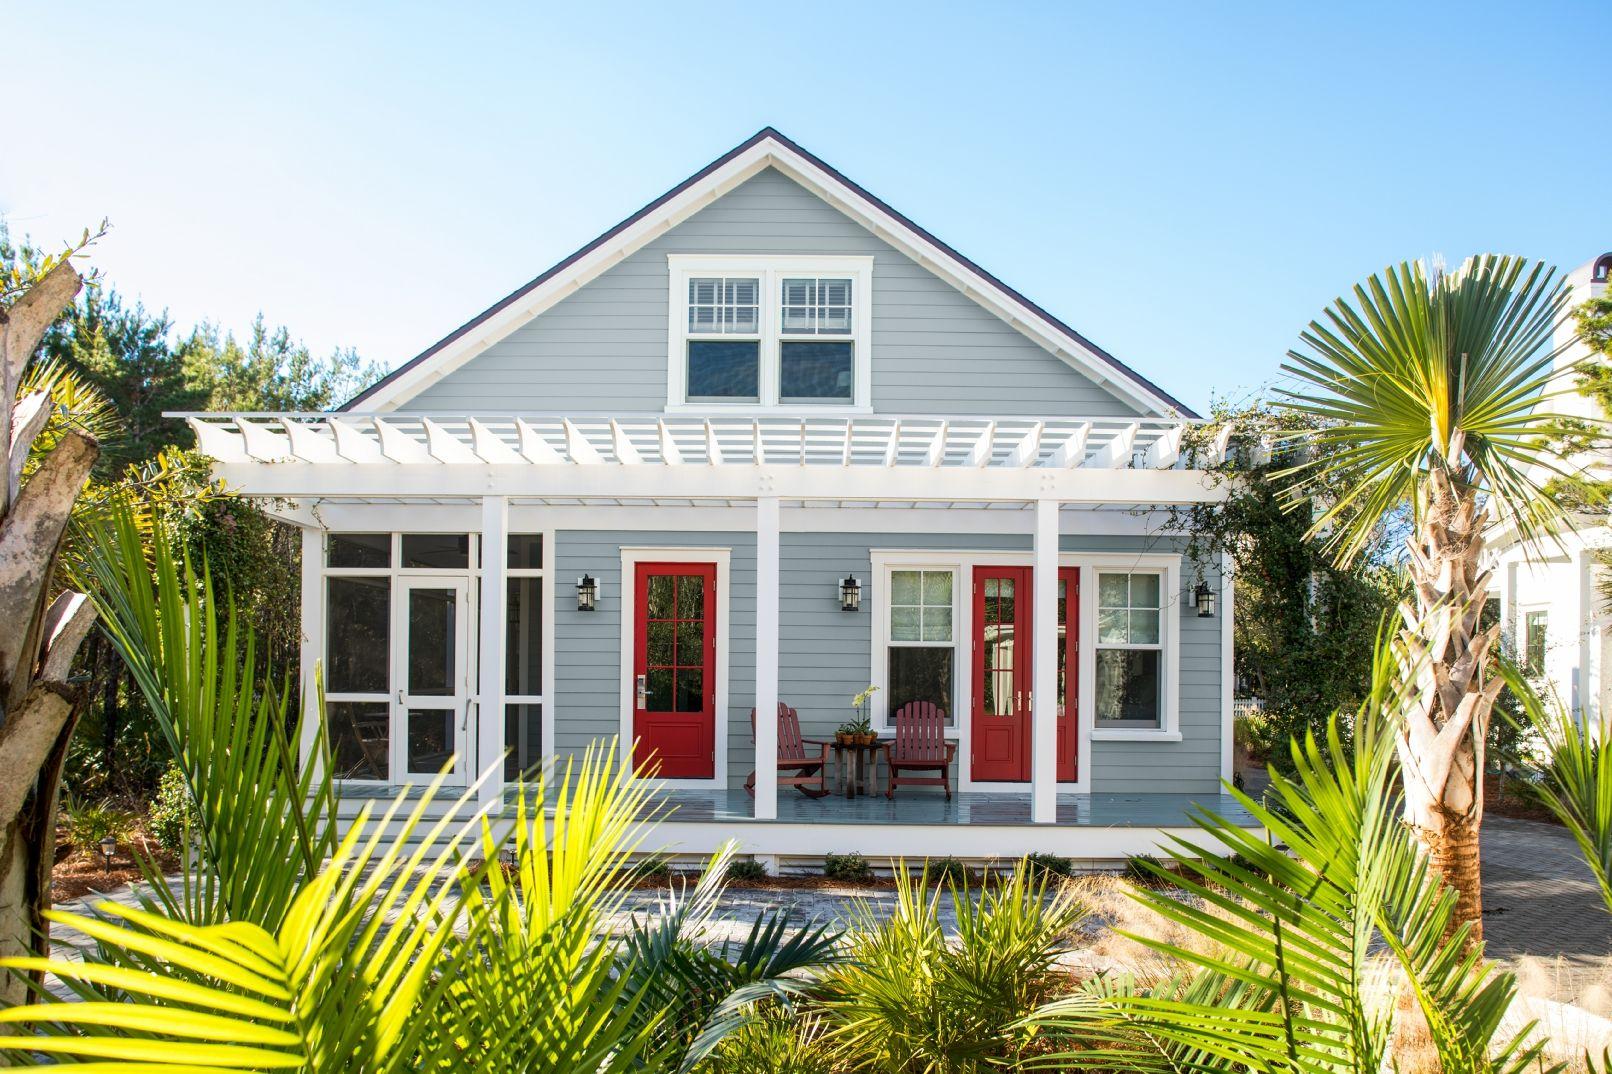 Home Exterior Color Ideas Inspiration Benjamin Moore House